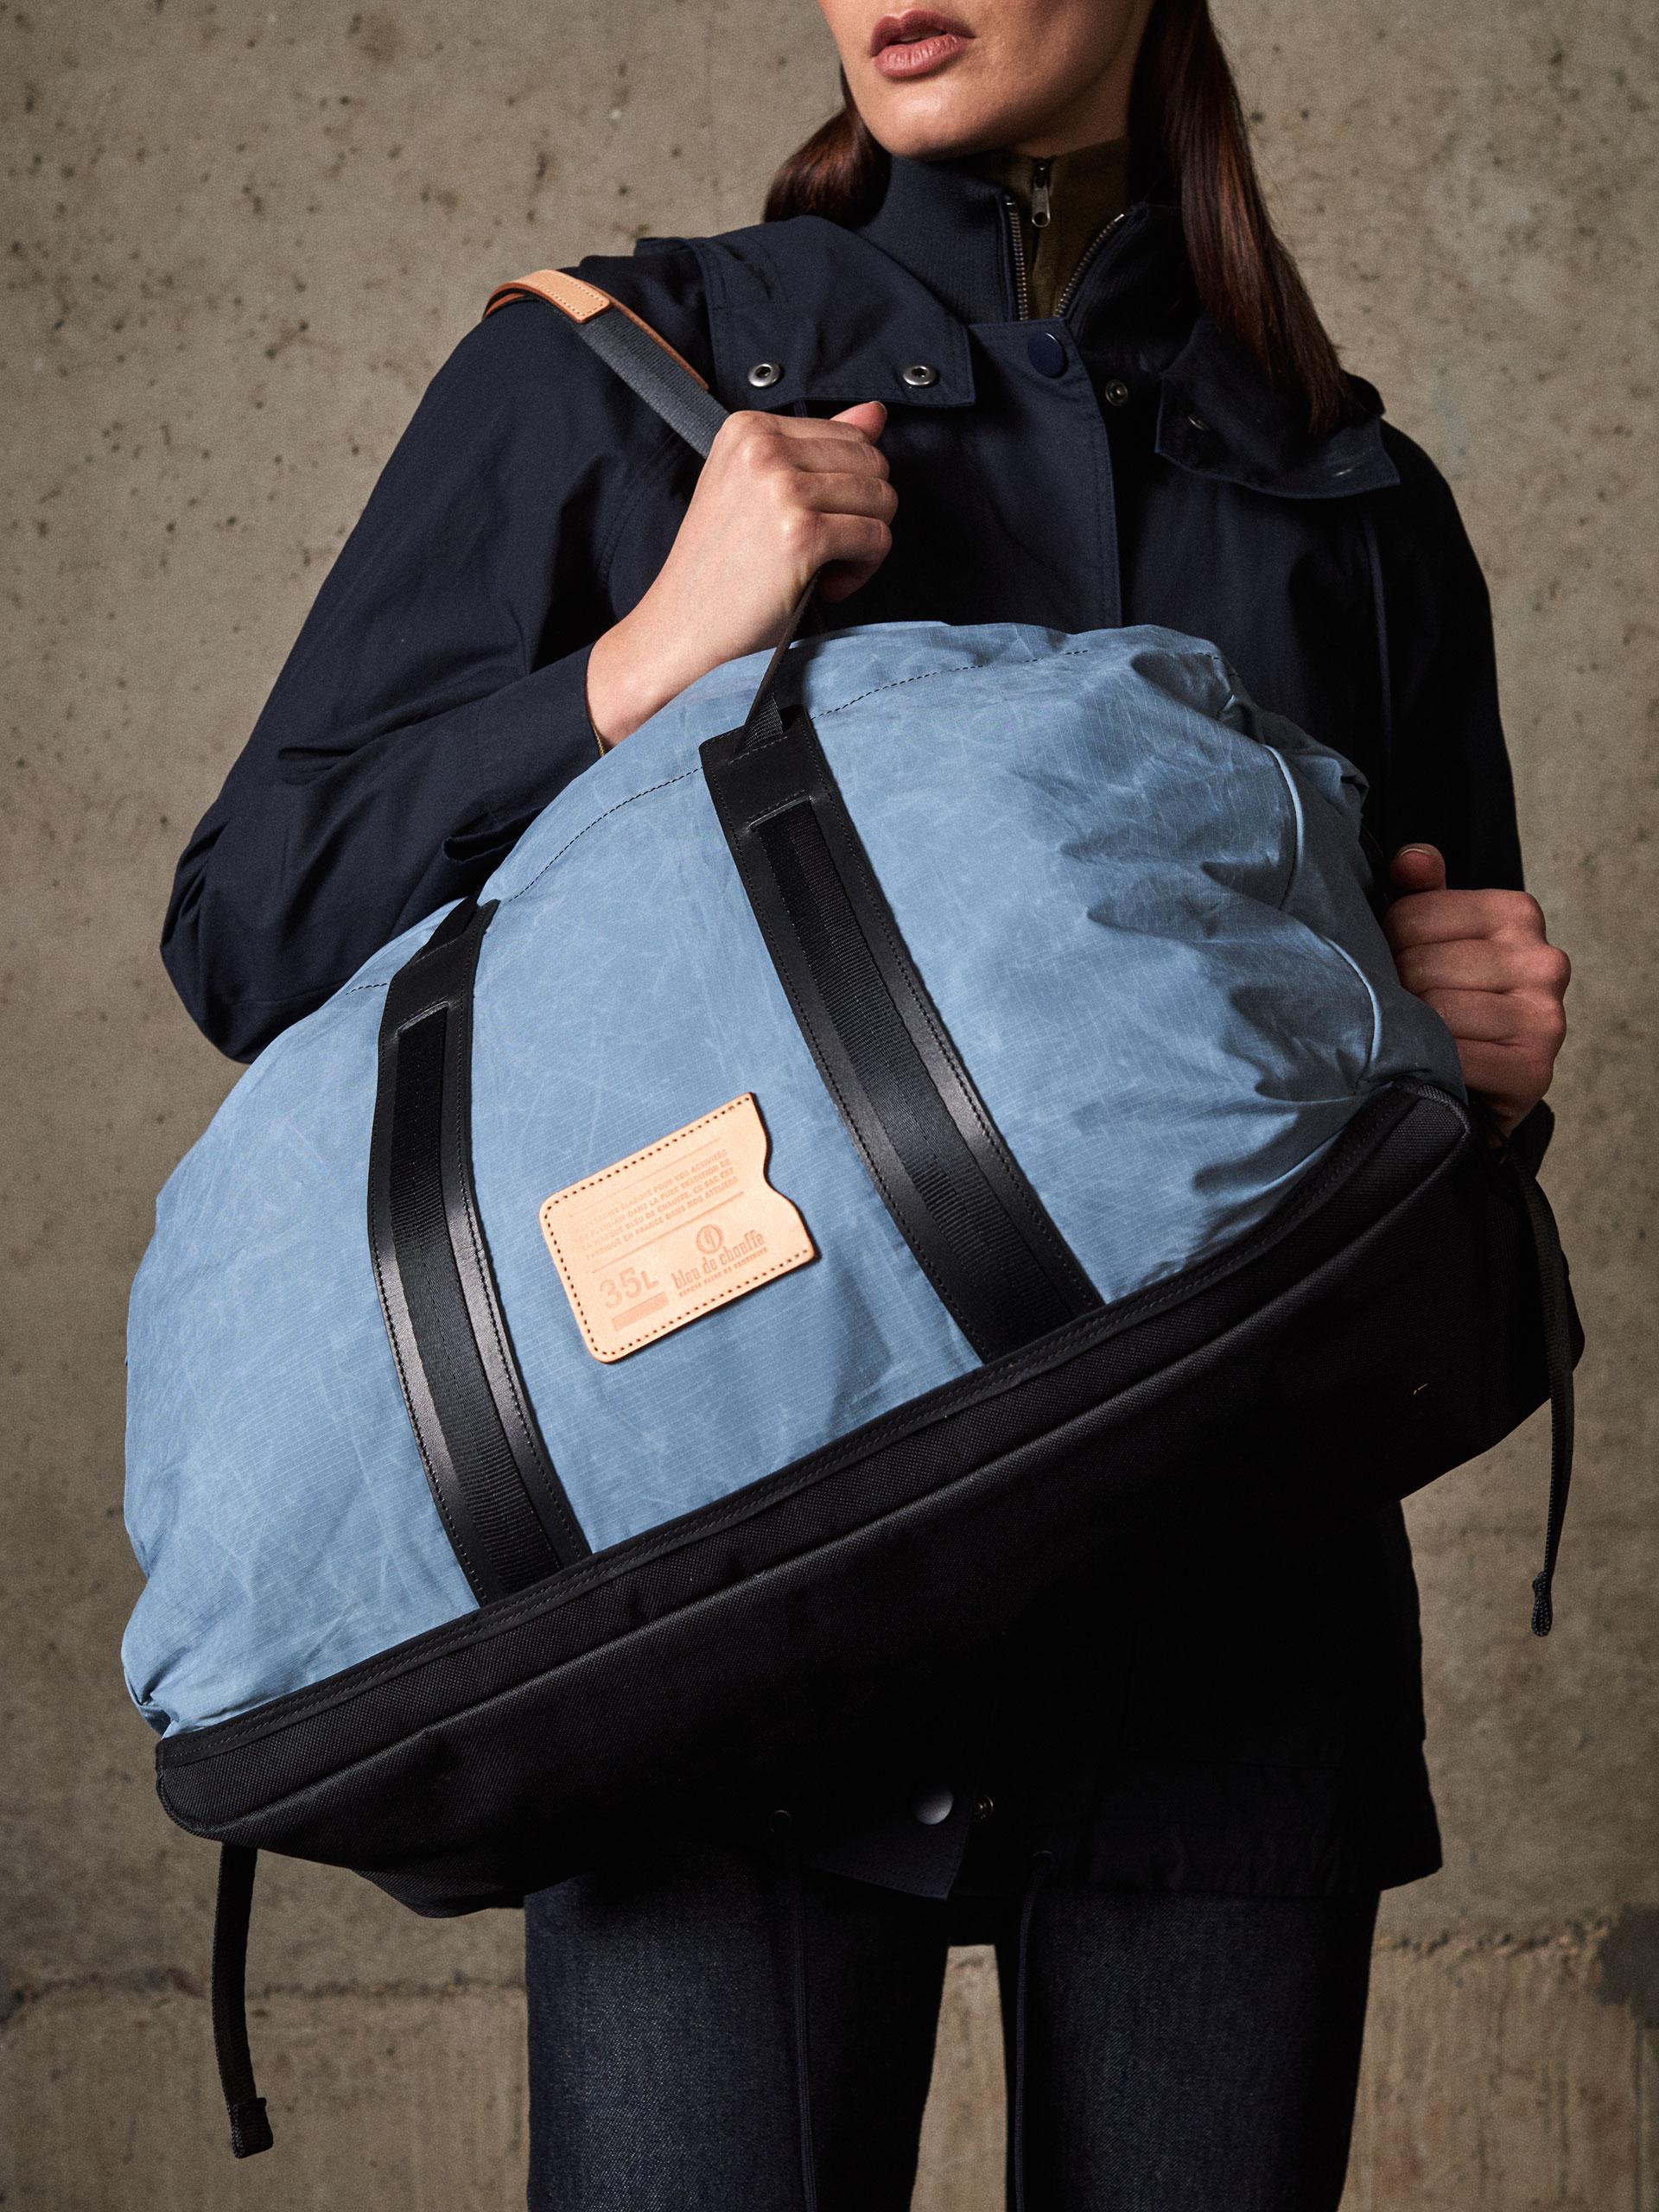 sac de voyage baroud 35l bleu gris bleu de chauffe. Black Bedroom Furniture Sets. Home Design Ideas